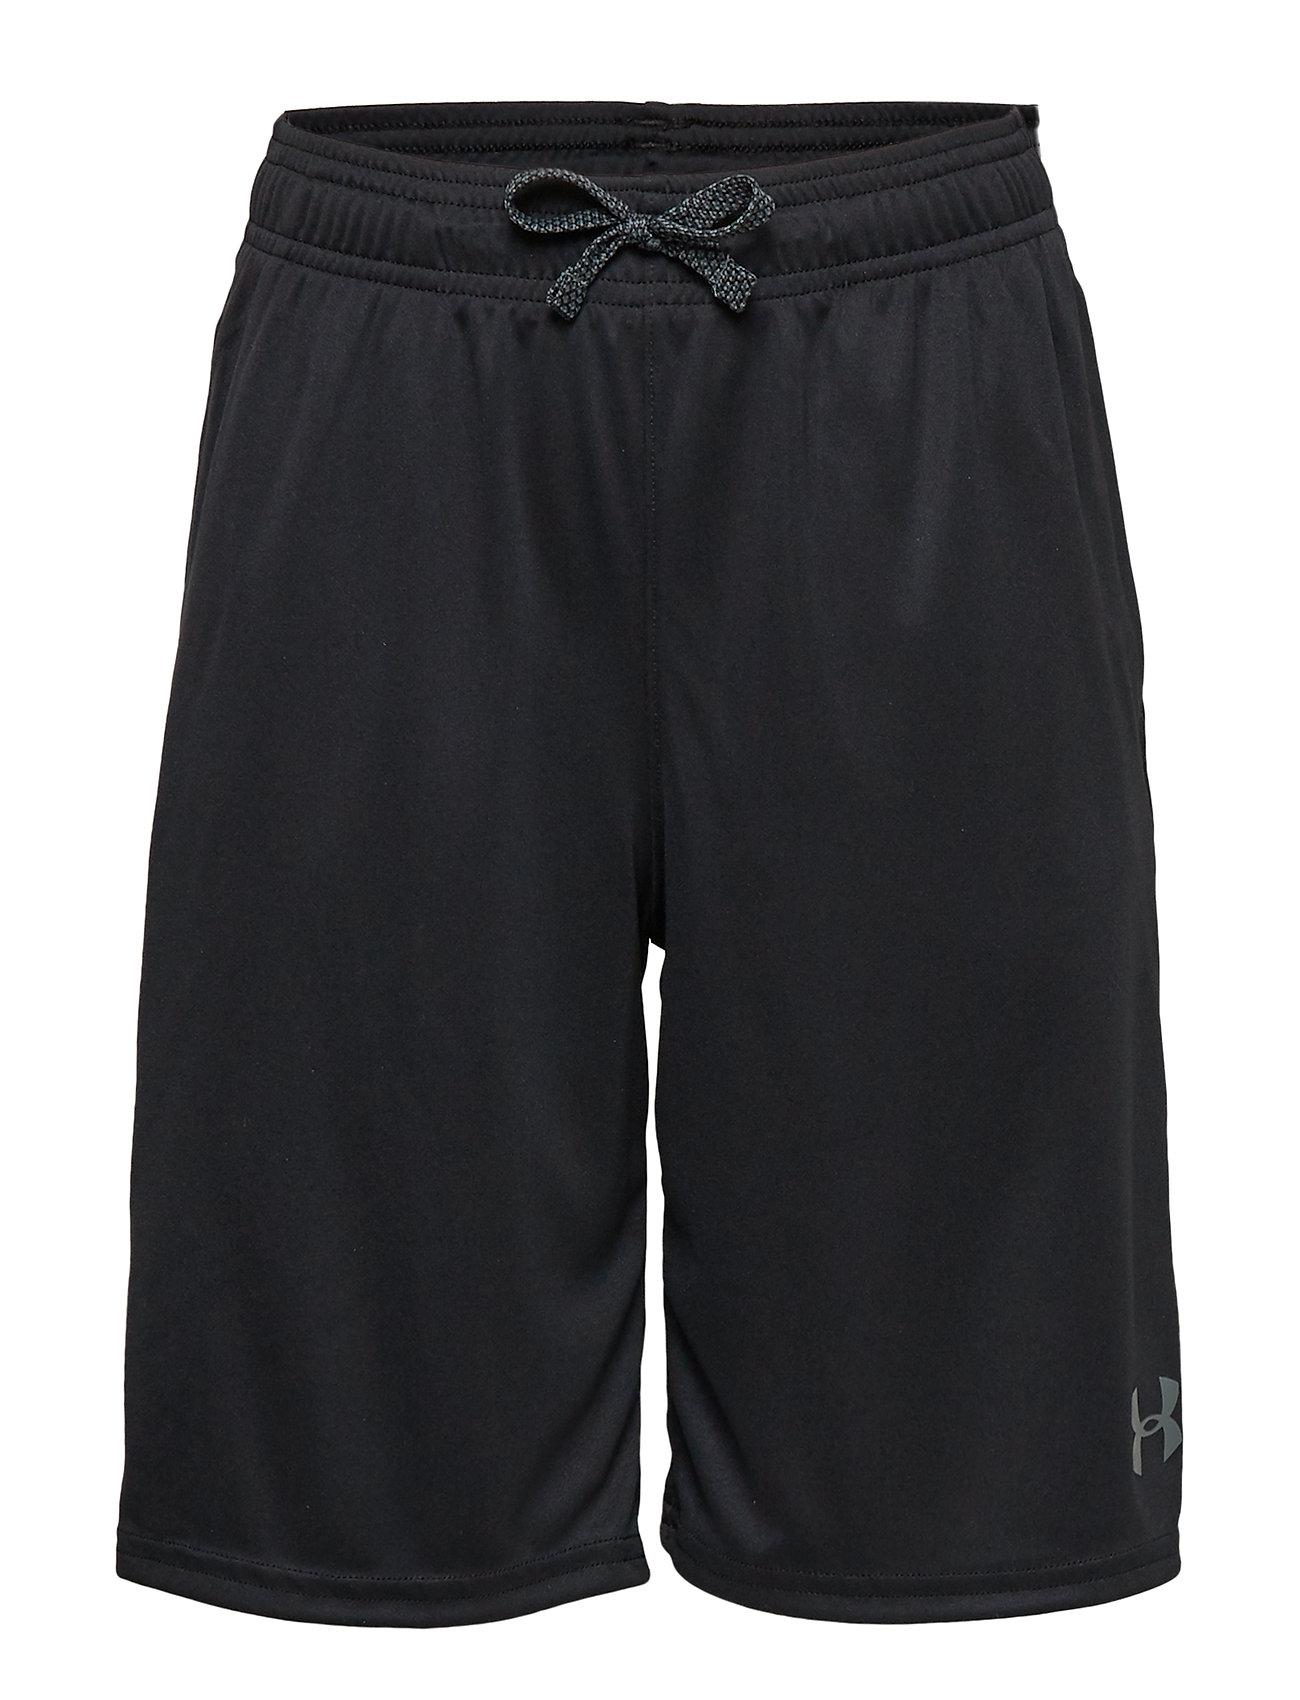 Under Armour Prototype Wordmark Shorts - BLACK